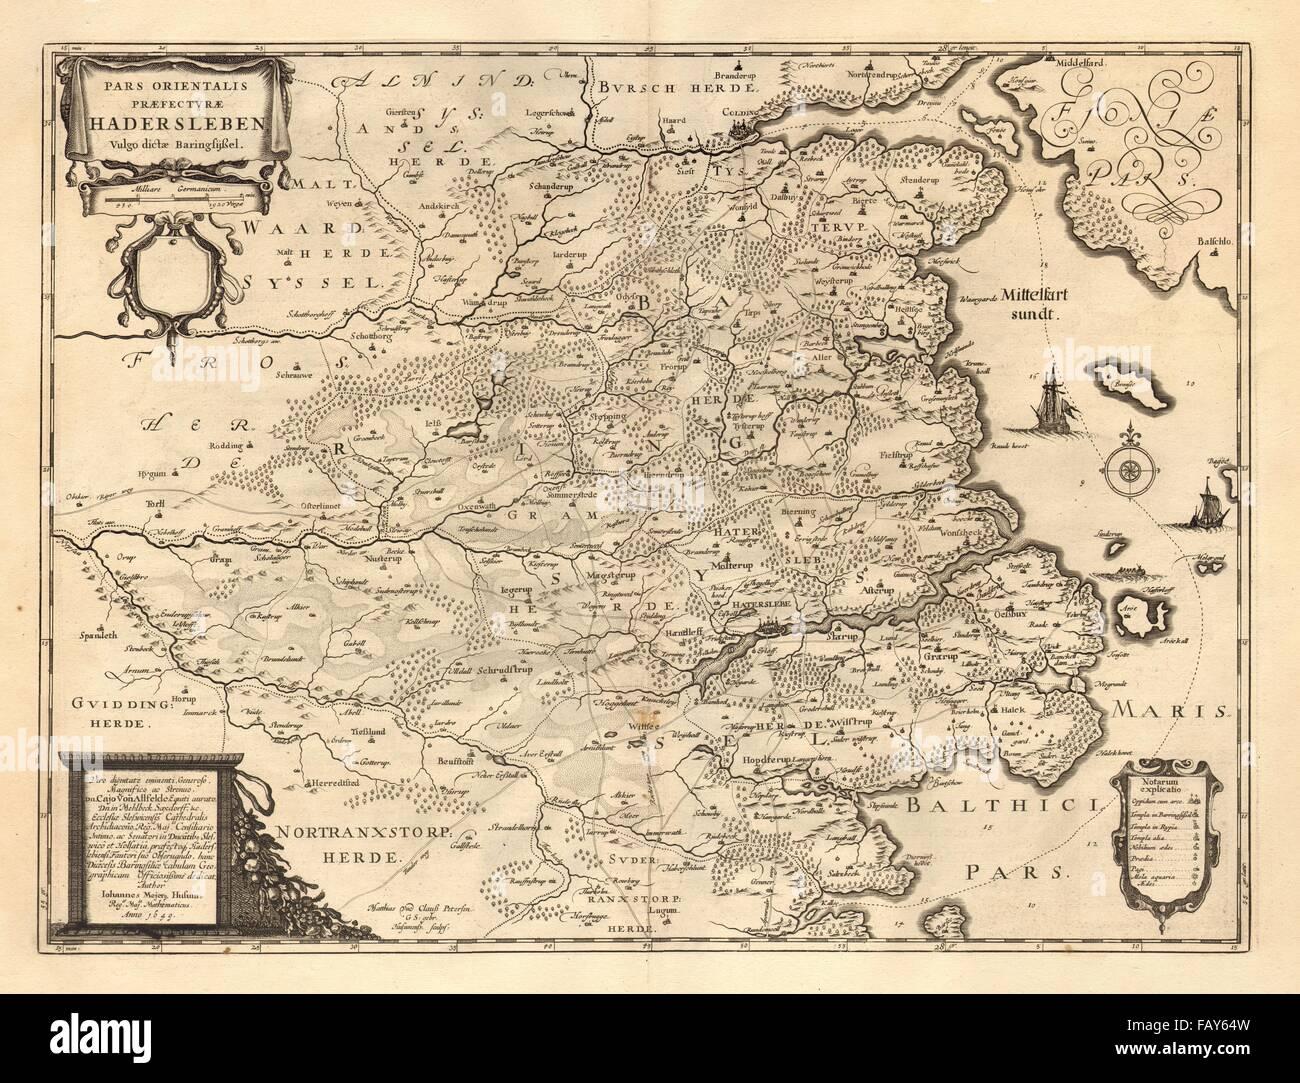 PARS ORIENTALIS PRAEFECTURAE HADERSLEBEN Haderslev Kolding BLAEU - Pars map